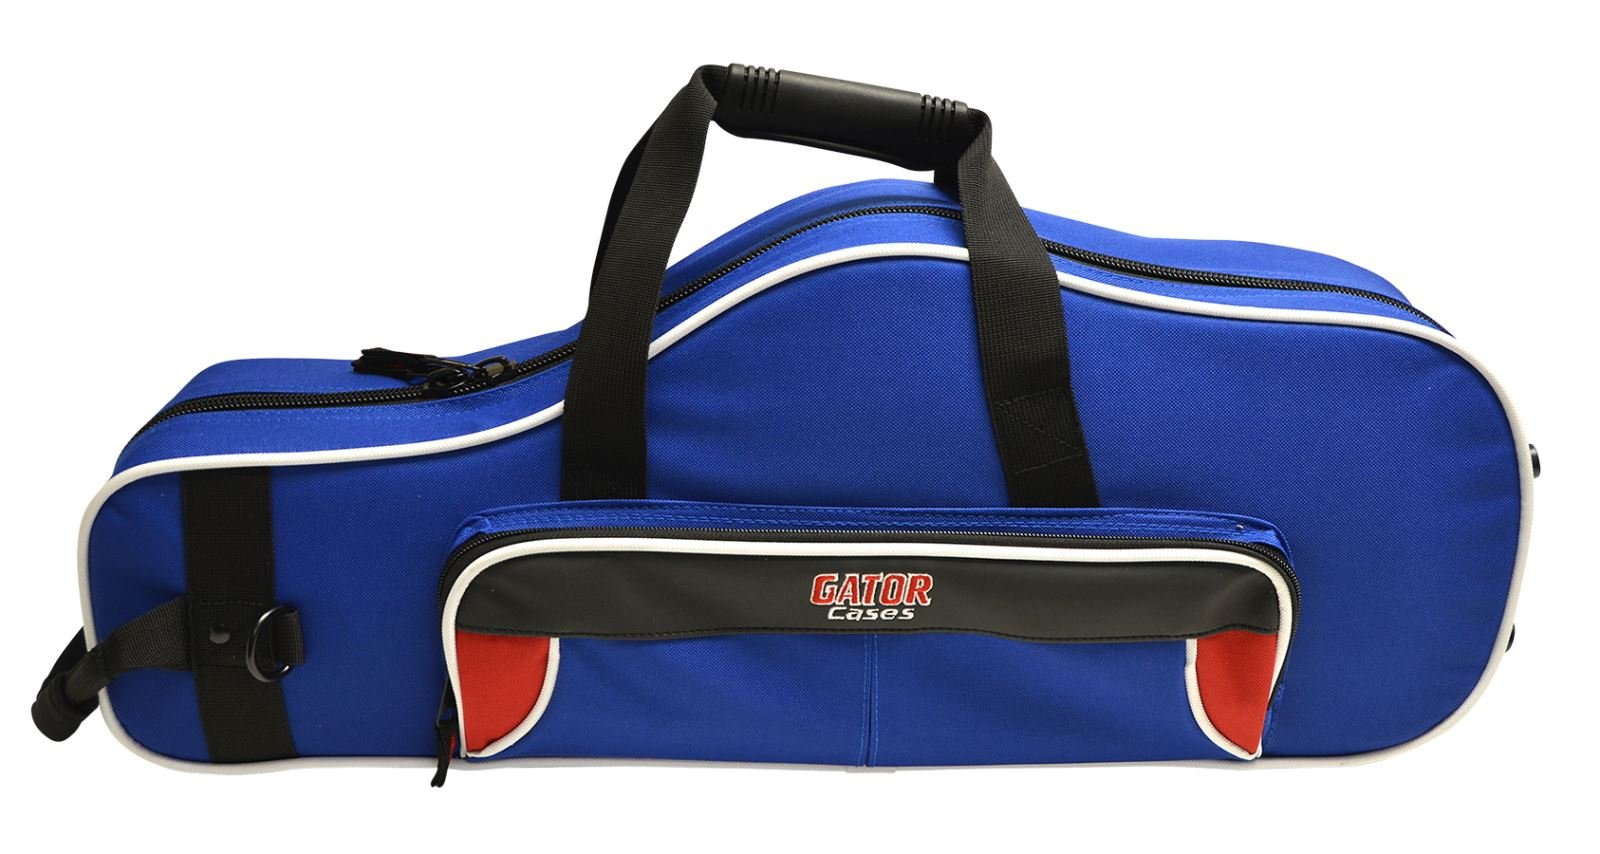 Gator GL-ALTOSAX-RB Lightweight Spirit Series Alto Saxophone Case, Red and Blue